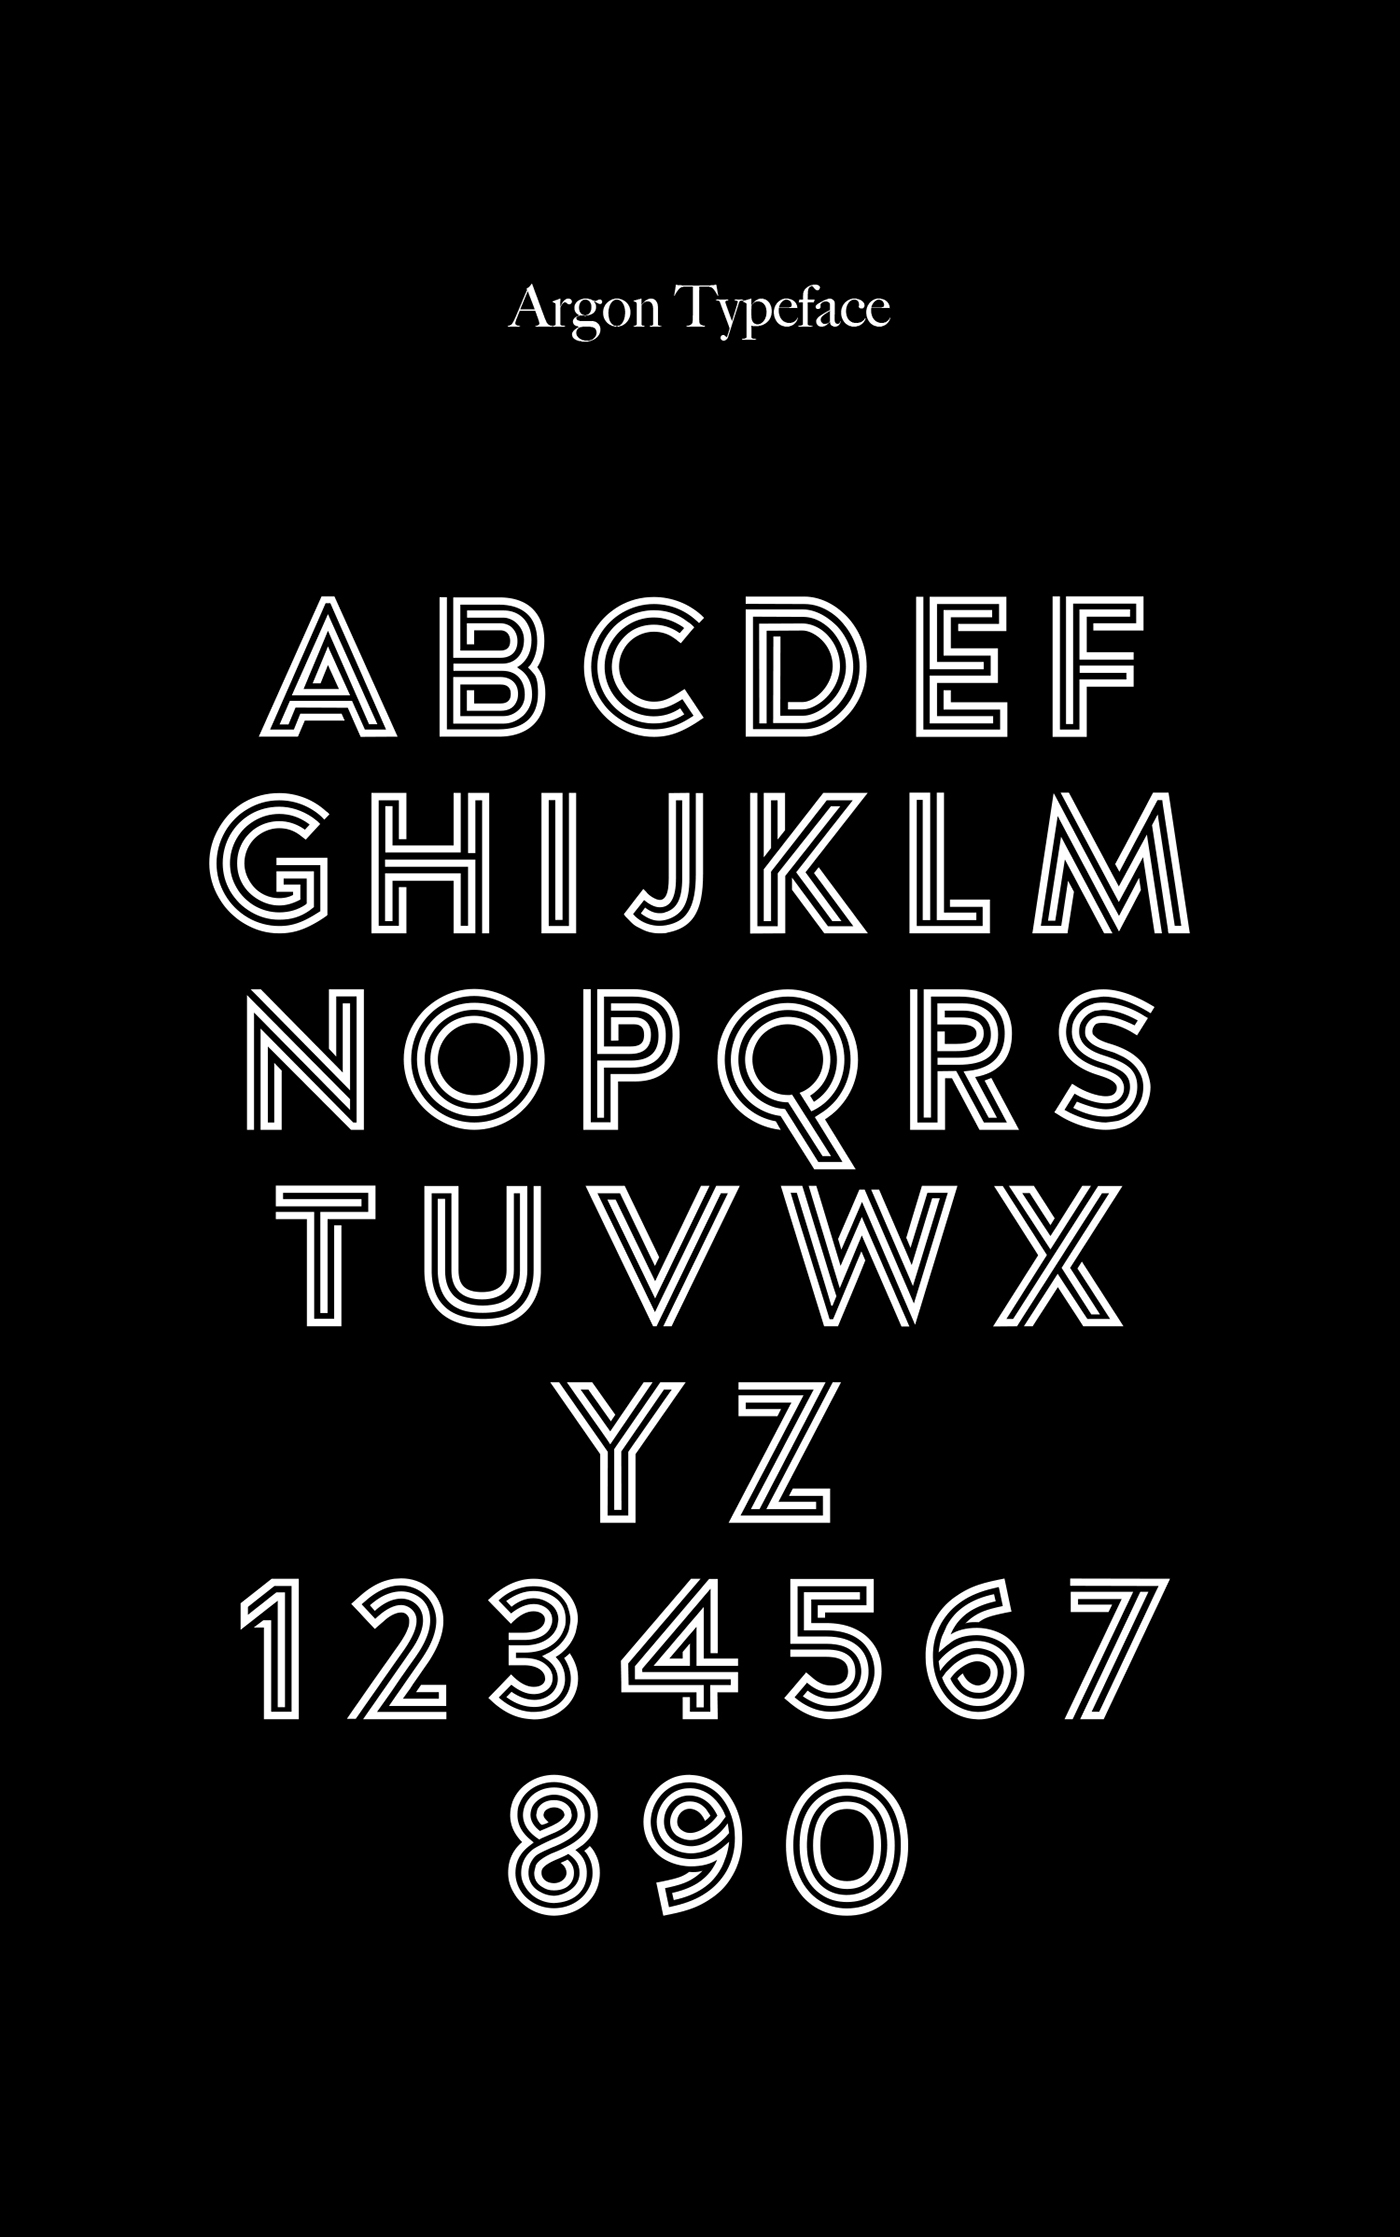 aragon typeface